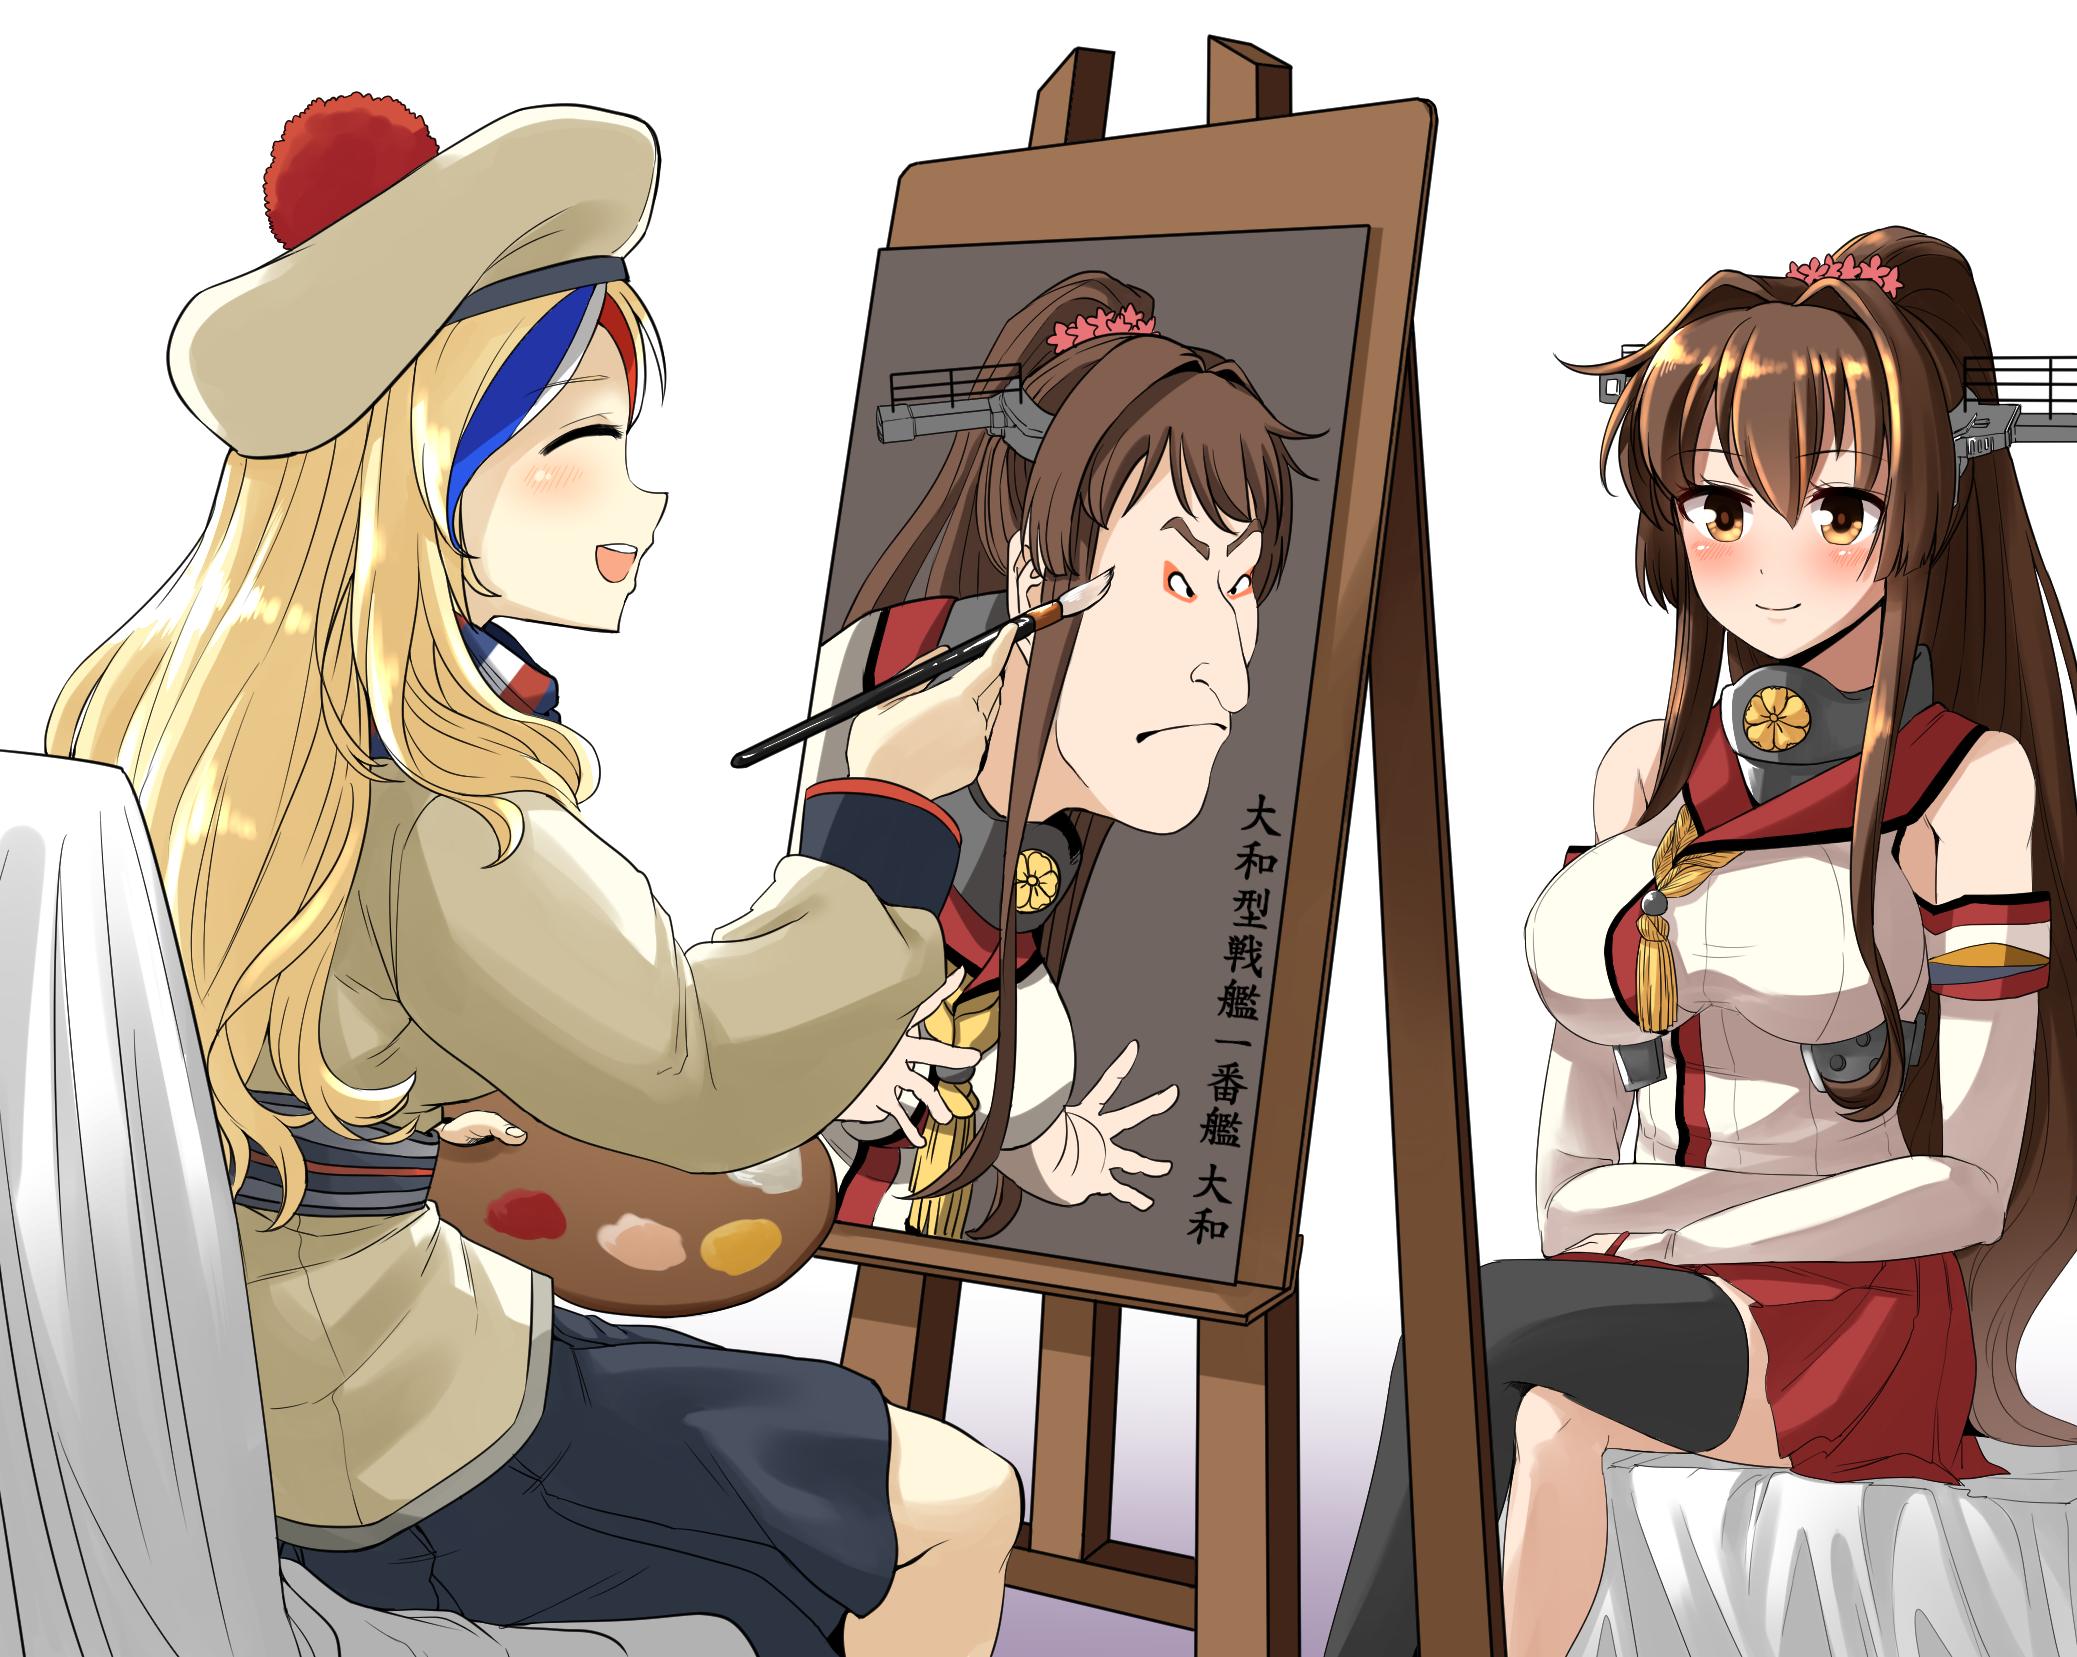 commandant_teste_and_yamato_kantai_collection_drawn_by_yong_gok__aae7cfb35b1cb72d54a6ad6d76881a3f.png